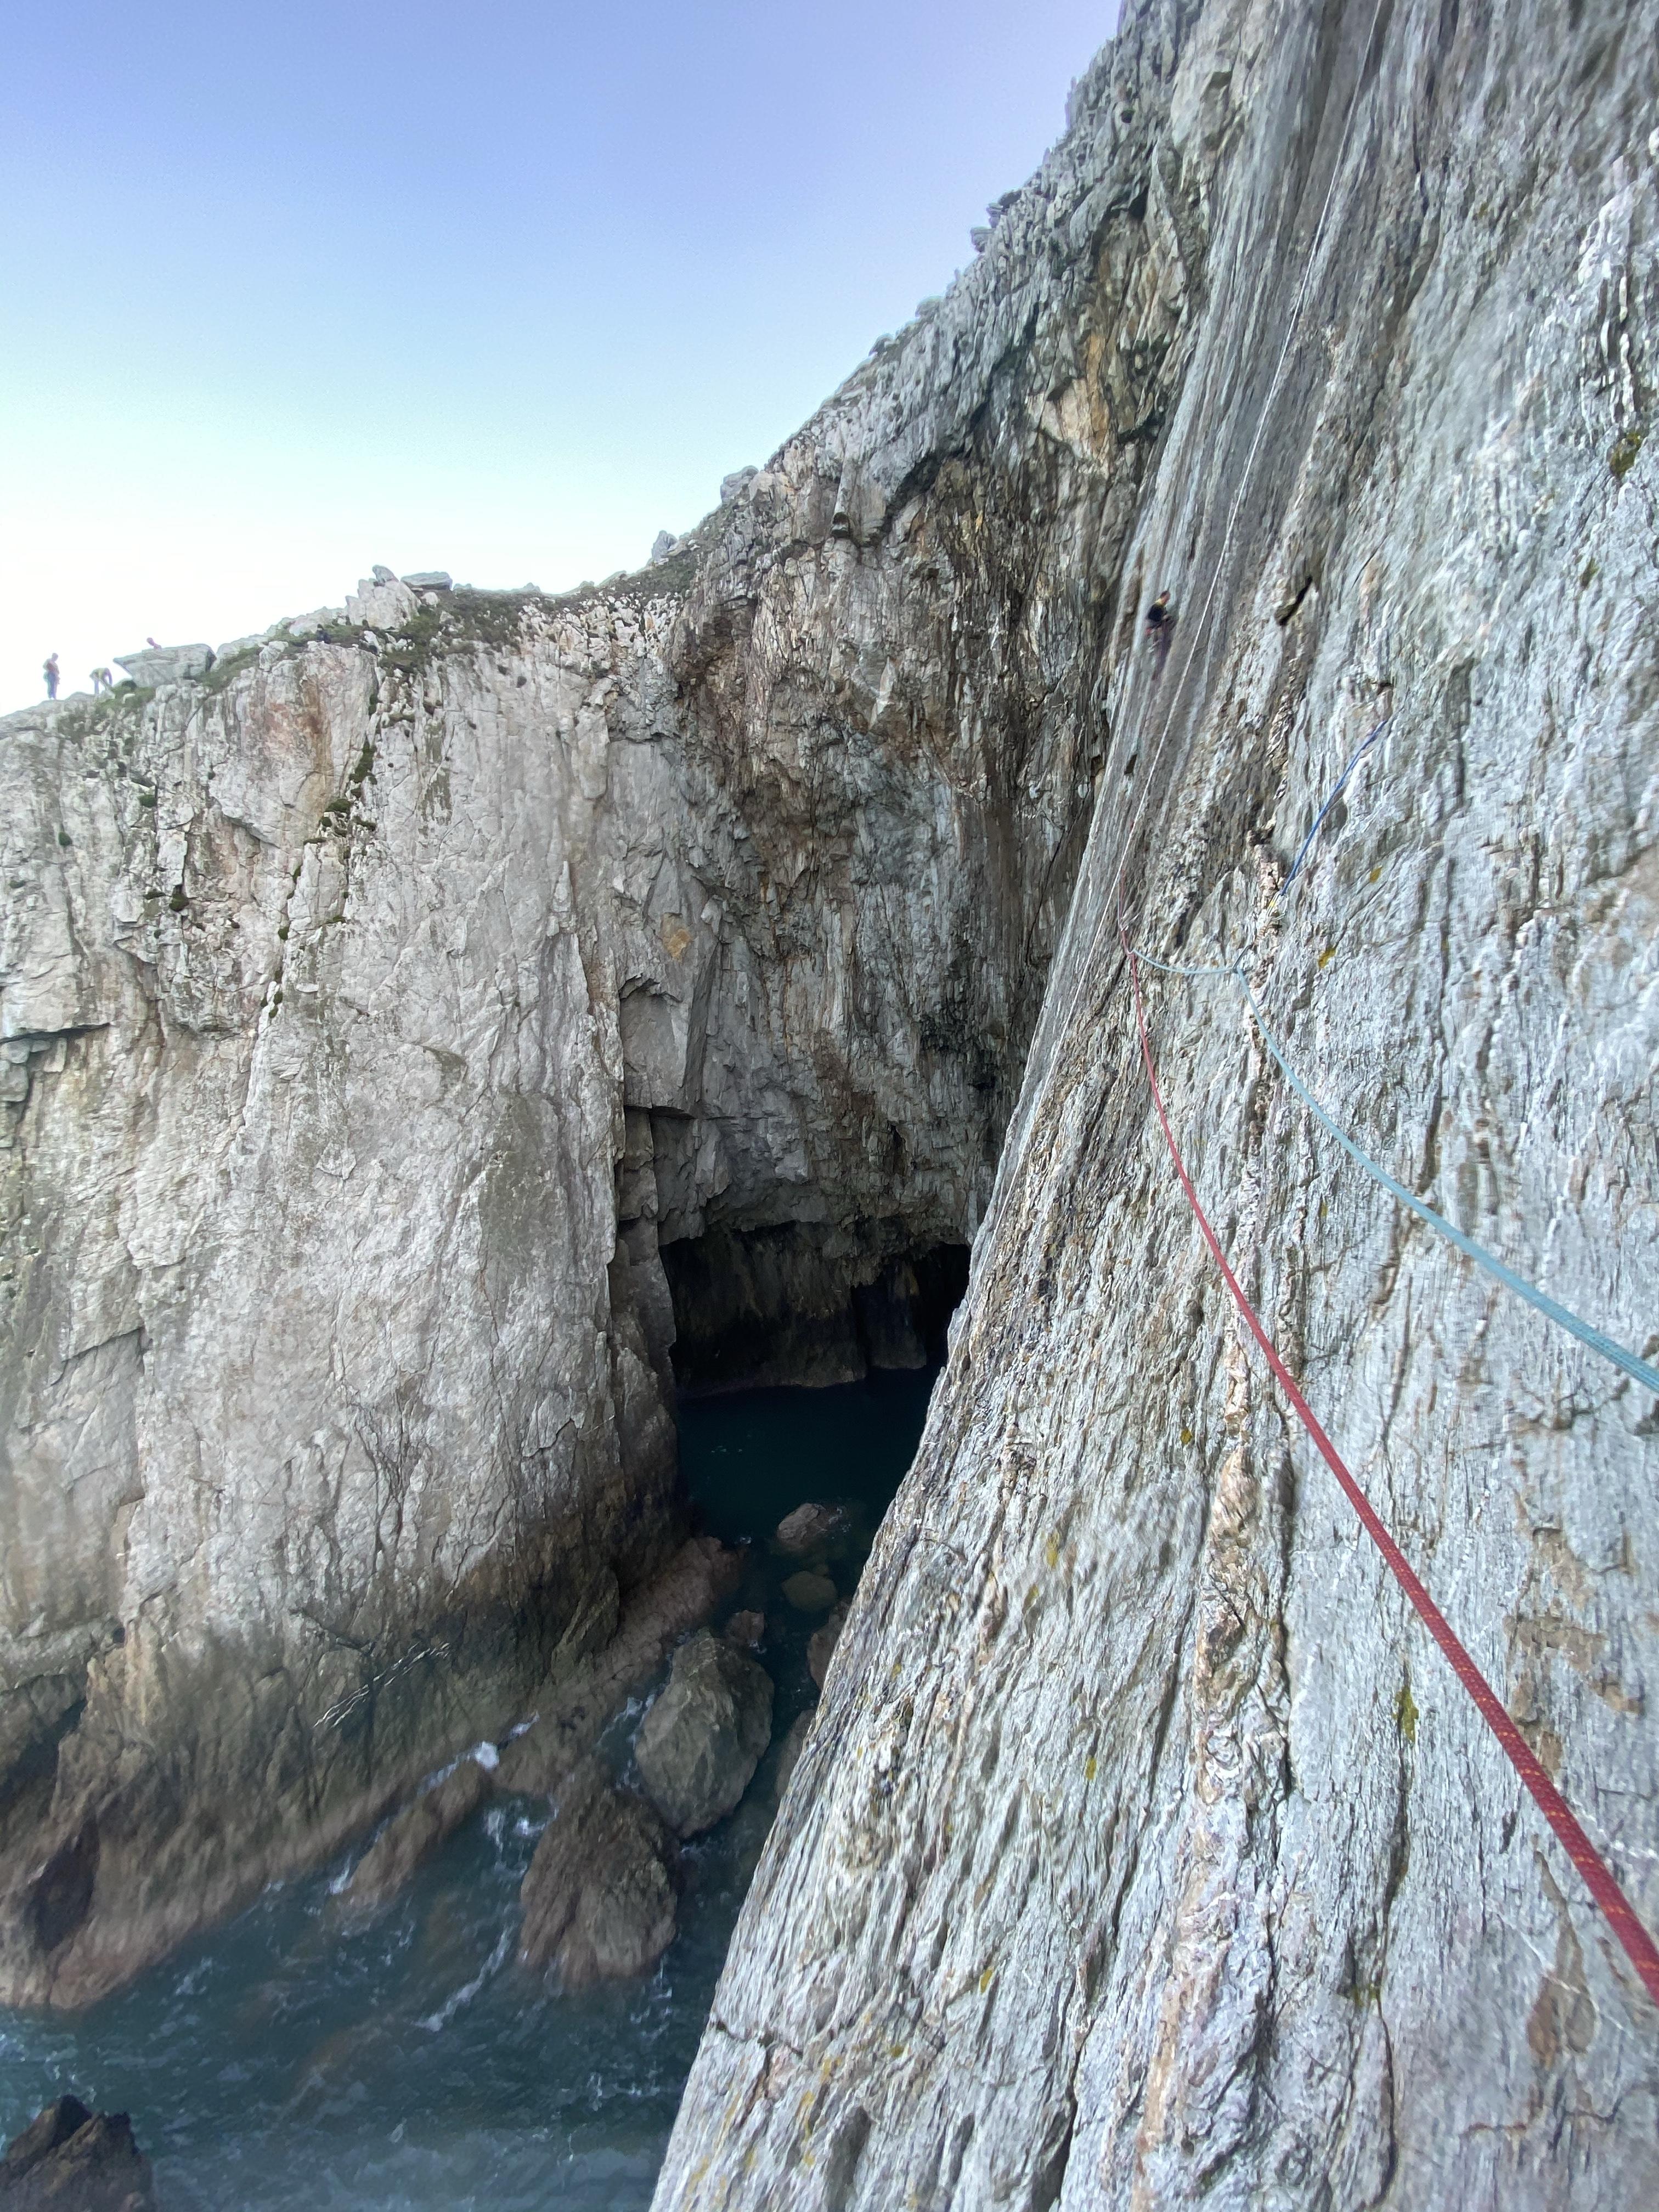 Holyhead climbing